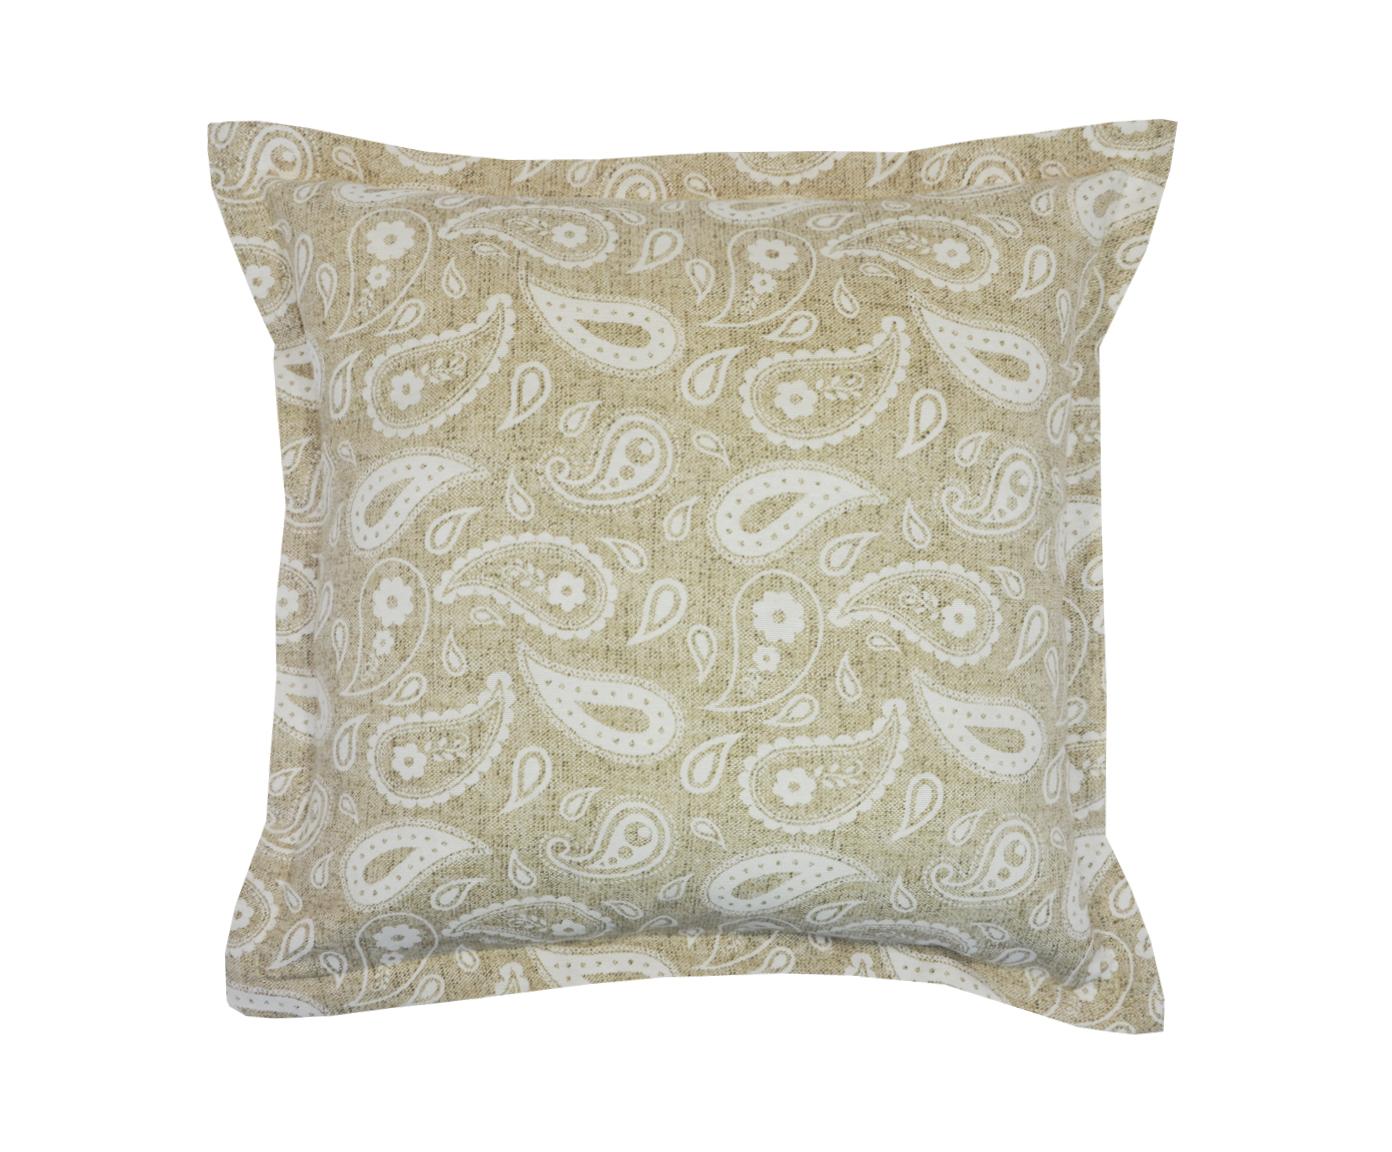 Подушка Paisley LinoКвадратные подушки<br>Декоративная  подушка .Чехол съемный.<br><br>Material: Хлопок<br>Length см: None<br>Width см: 45<br>Depth см: 15<br>Height см: 45